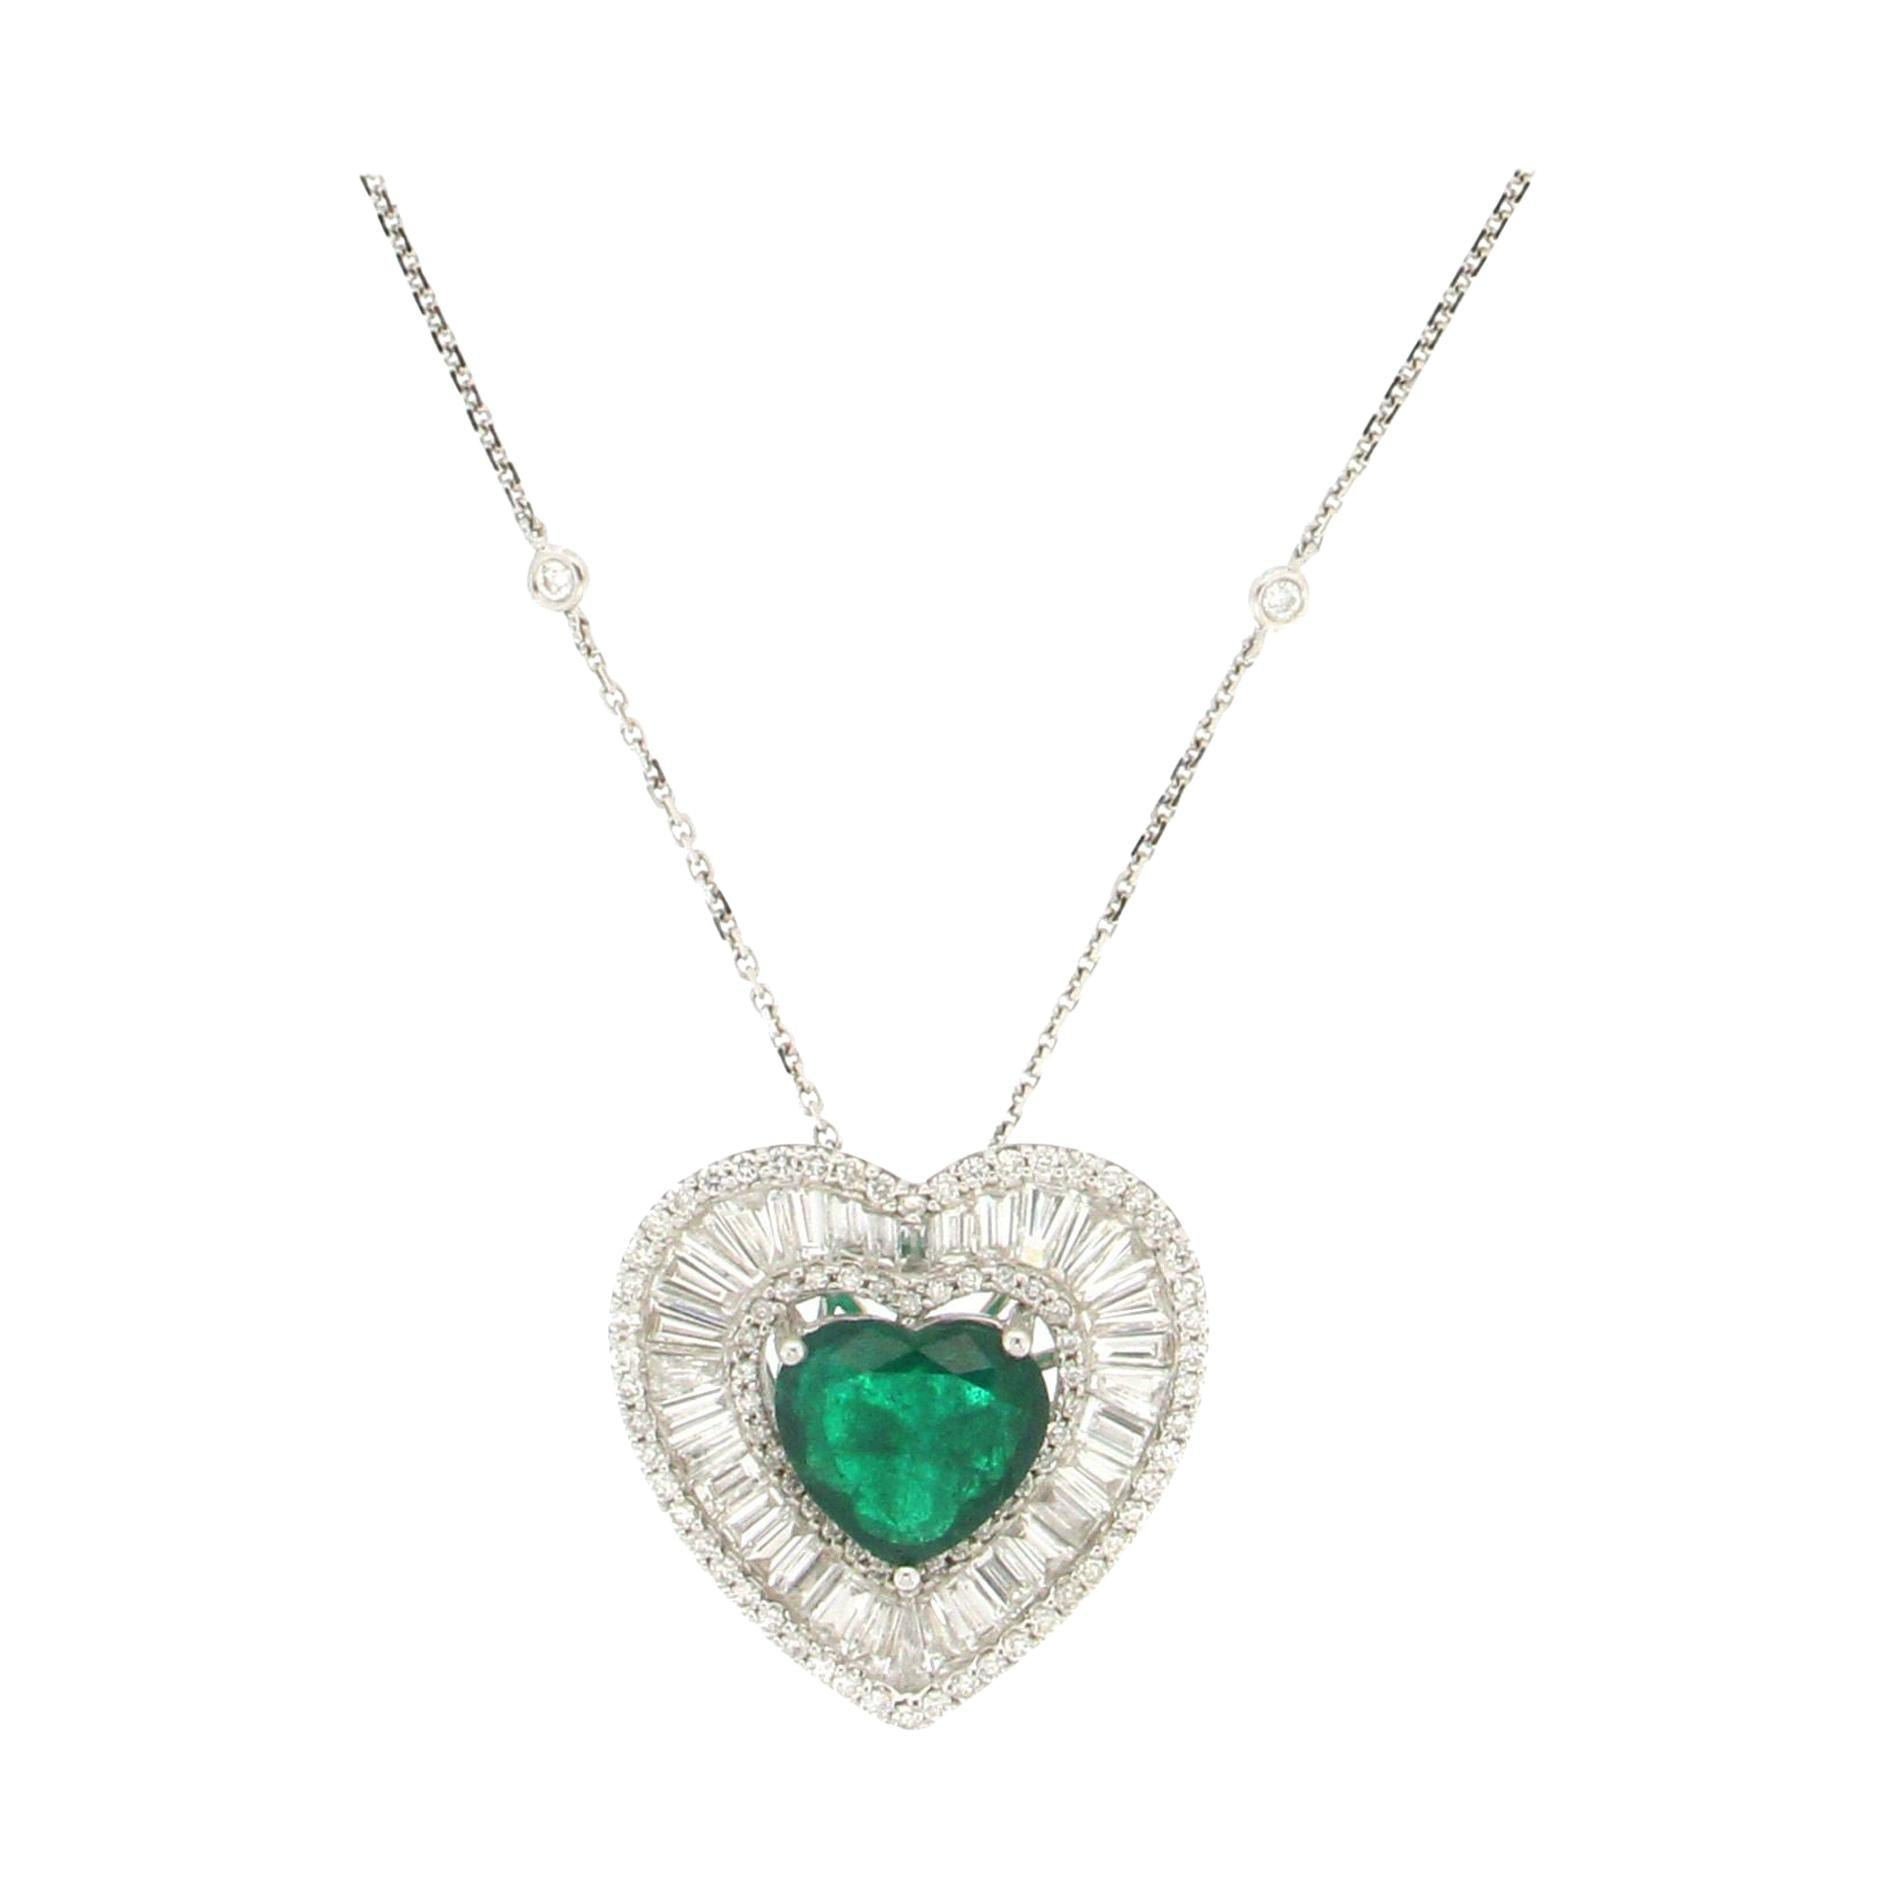 Handcraft Brazilian Emerald Heart 18 Karat White Gold Diamonds Pendant Necklace